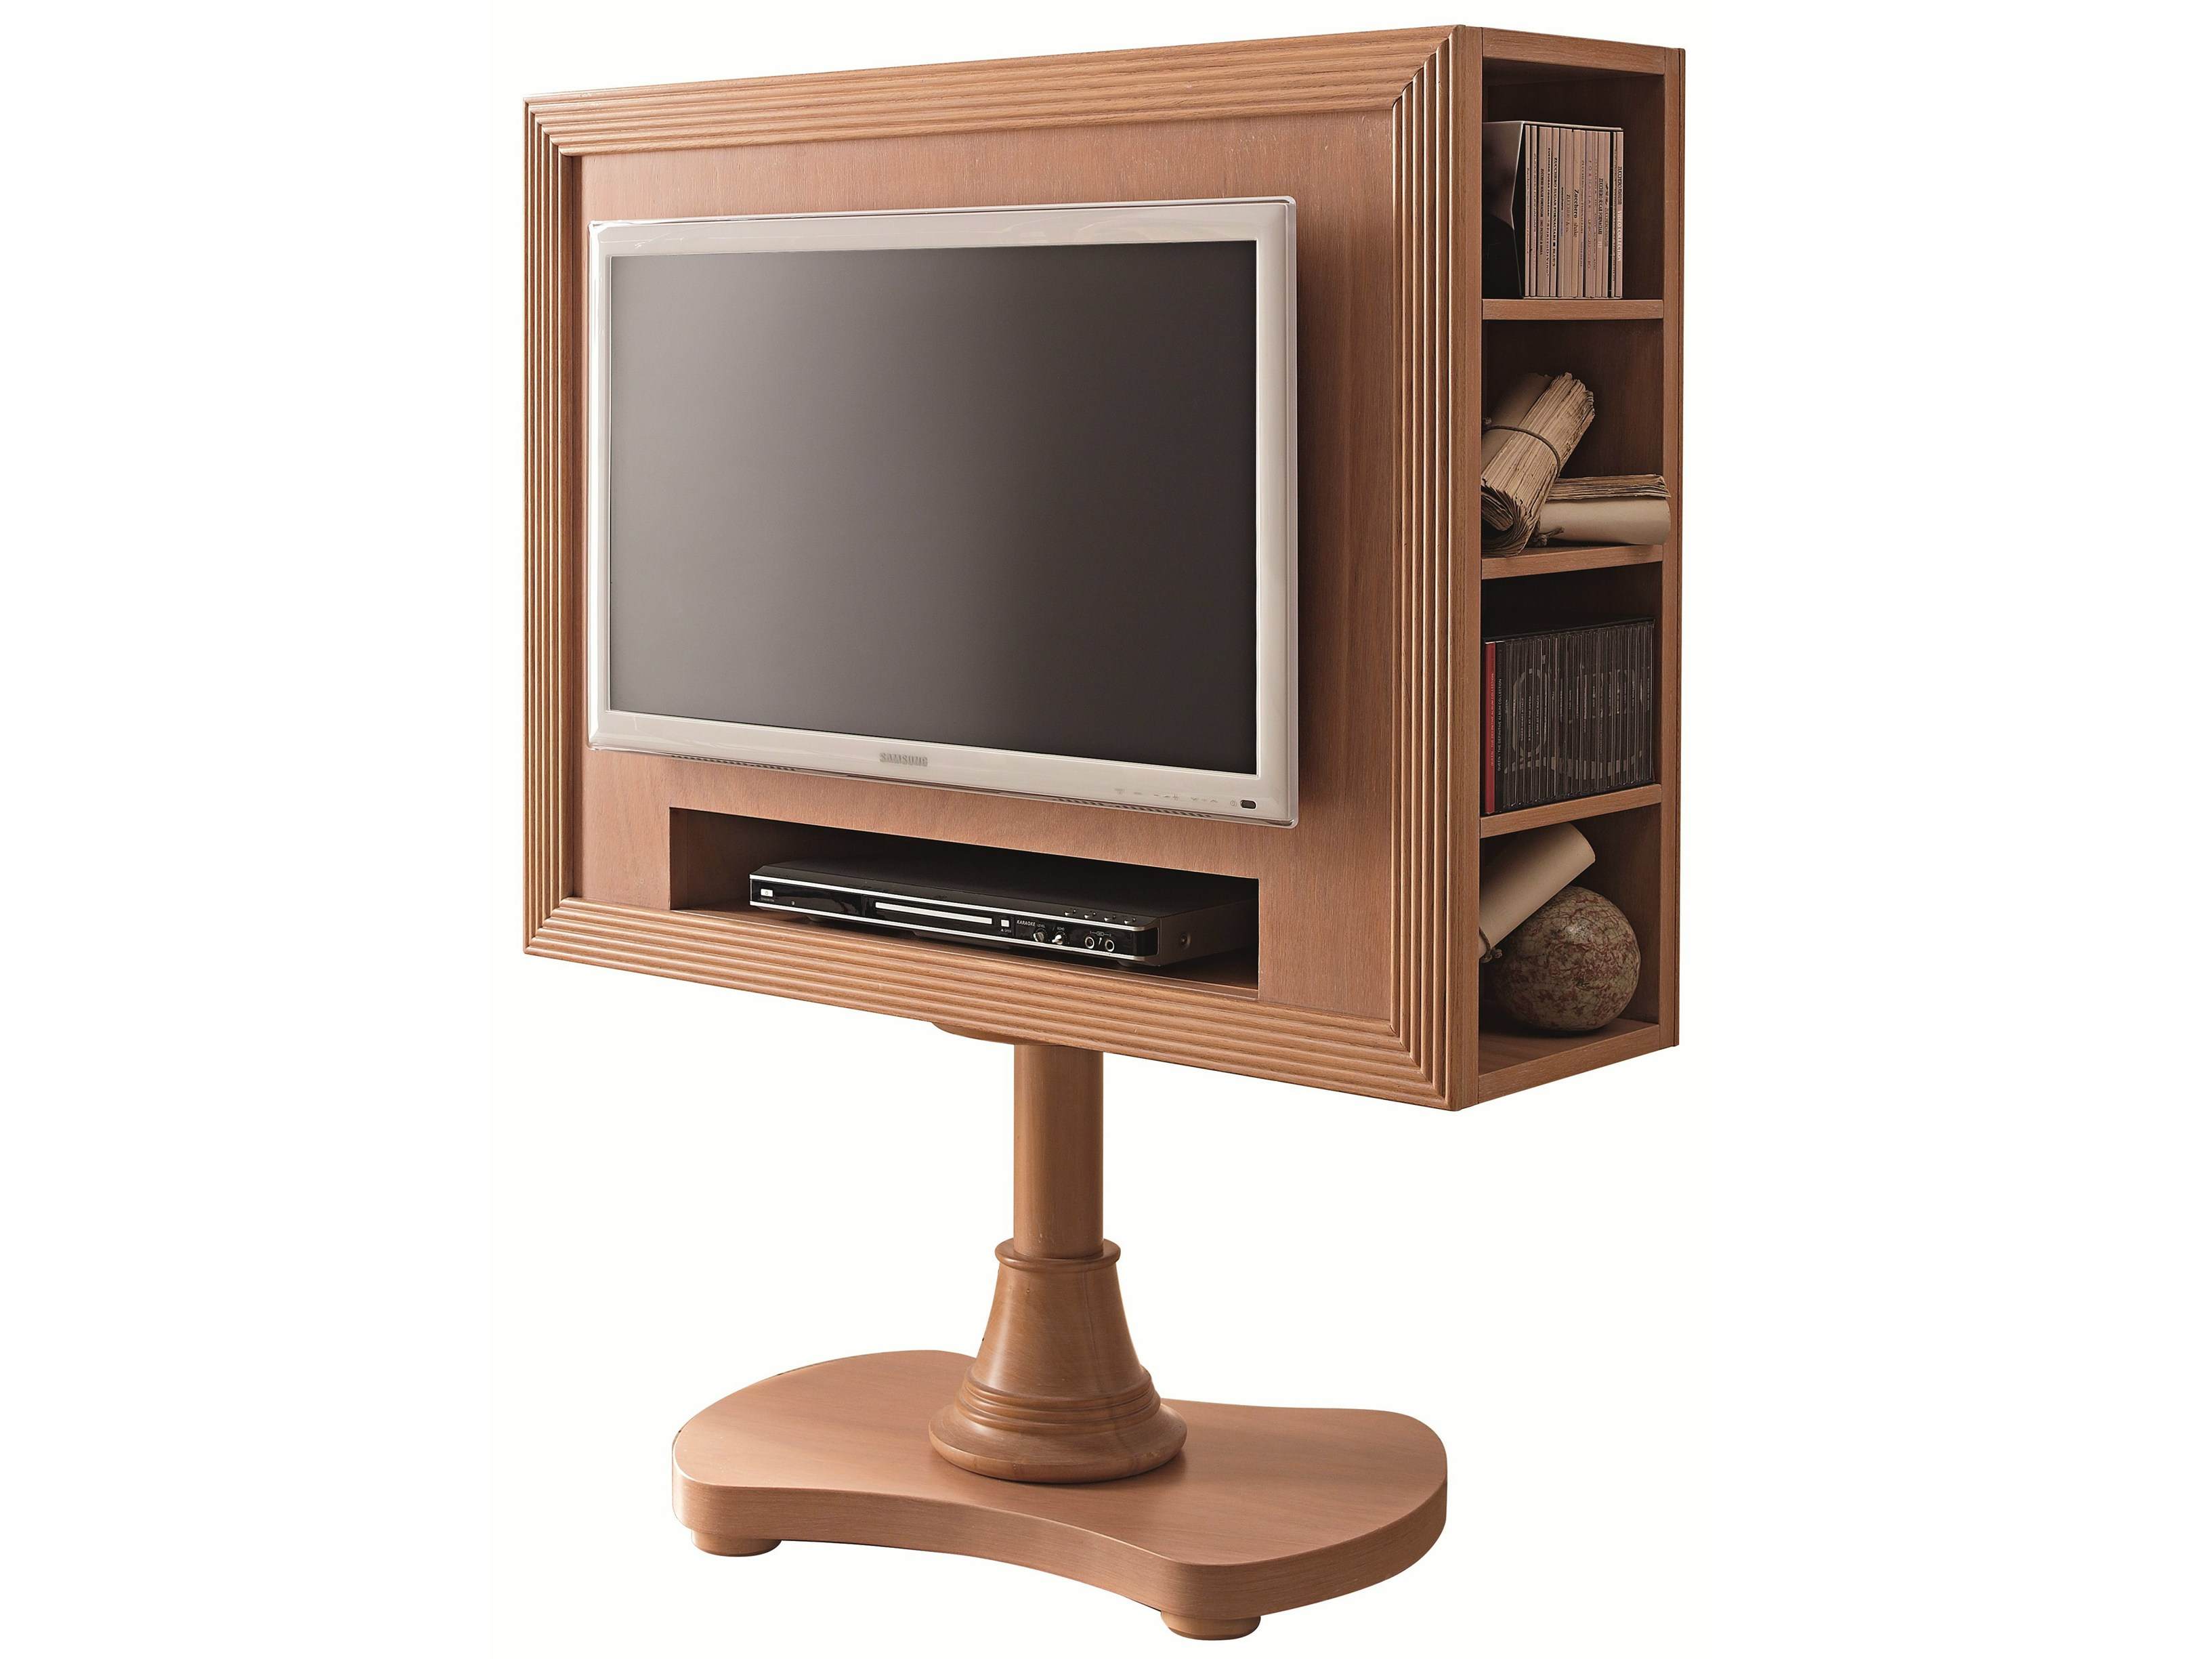 663 meuble tv pivotant by caroti. Black Bedroom Furniture Sets. Home Design Ideas